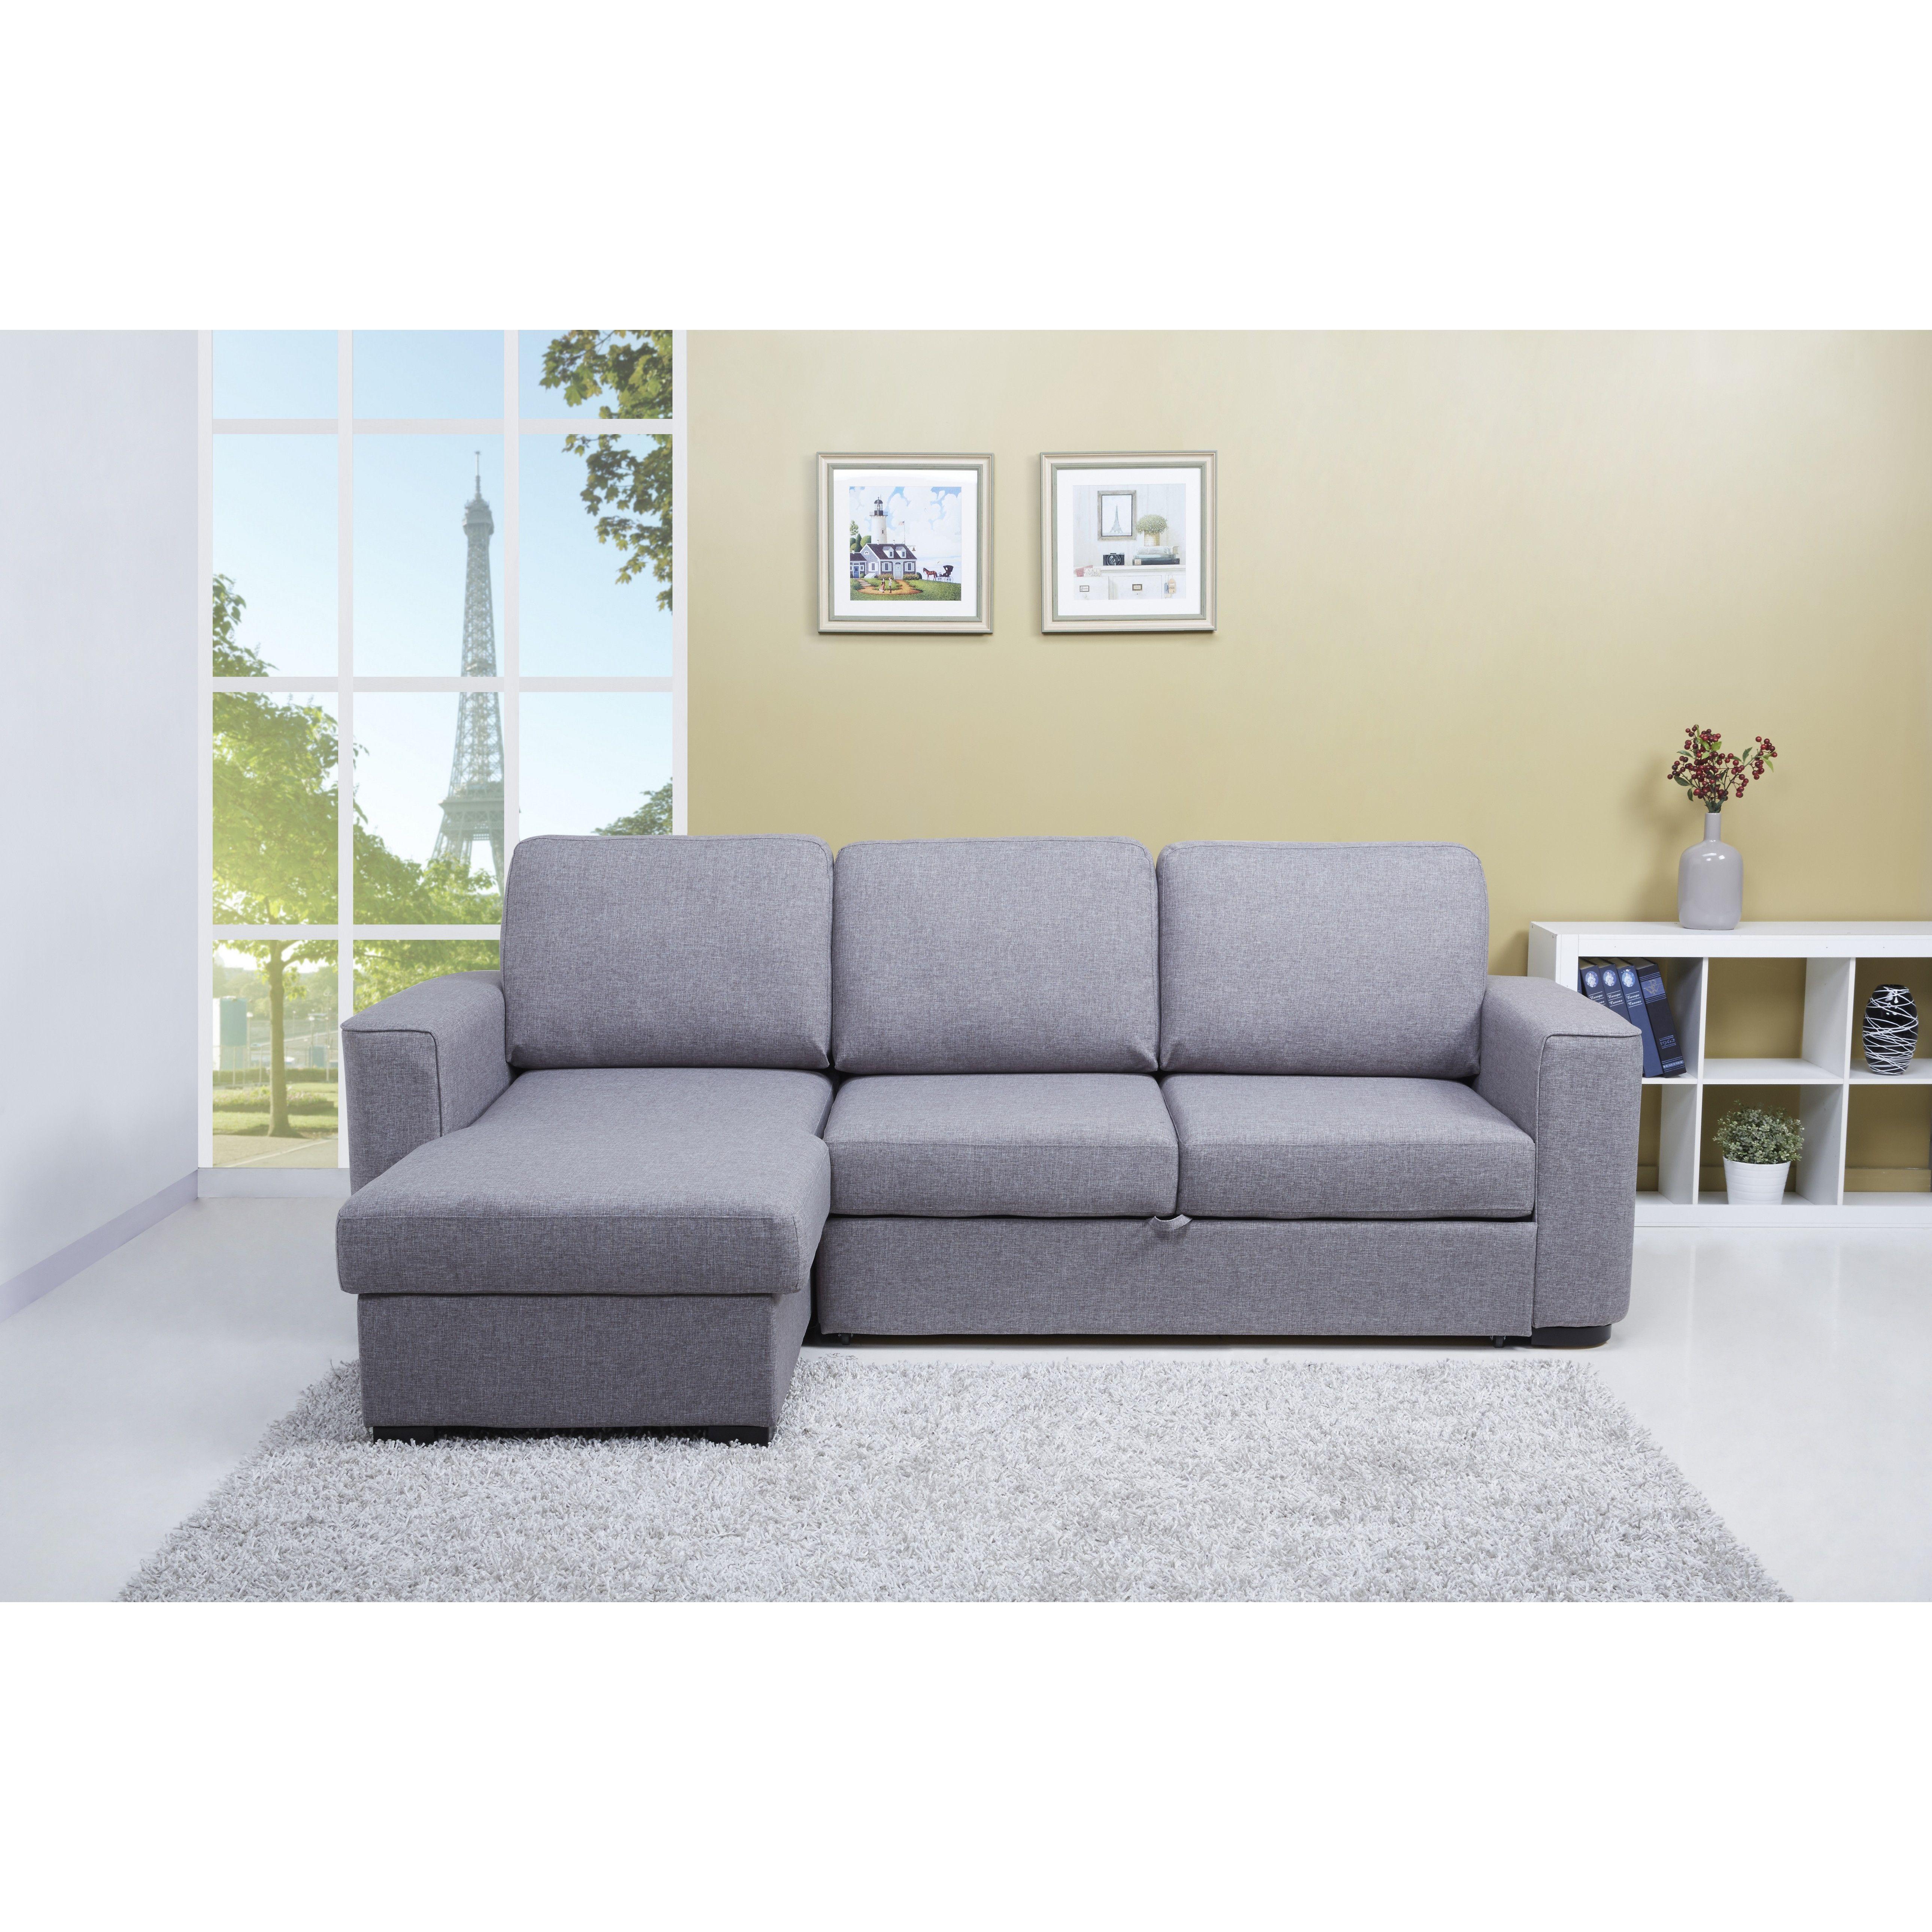 Chul Reversible Sleeper Corner Sofa Bed Interer